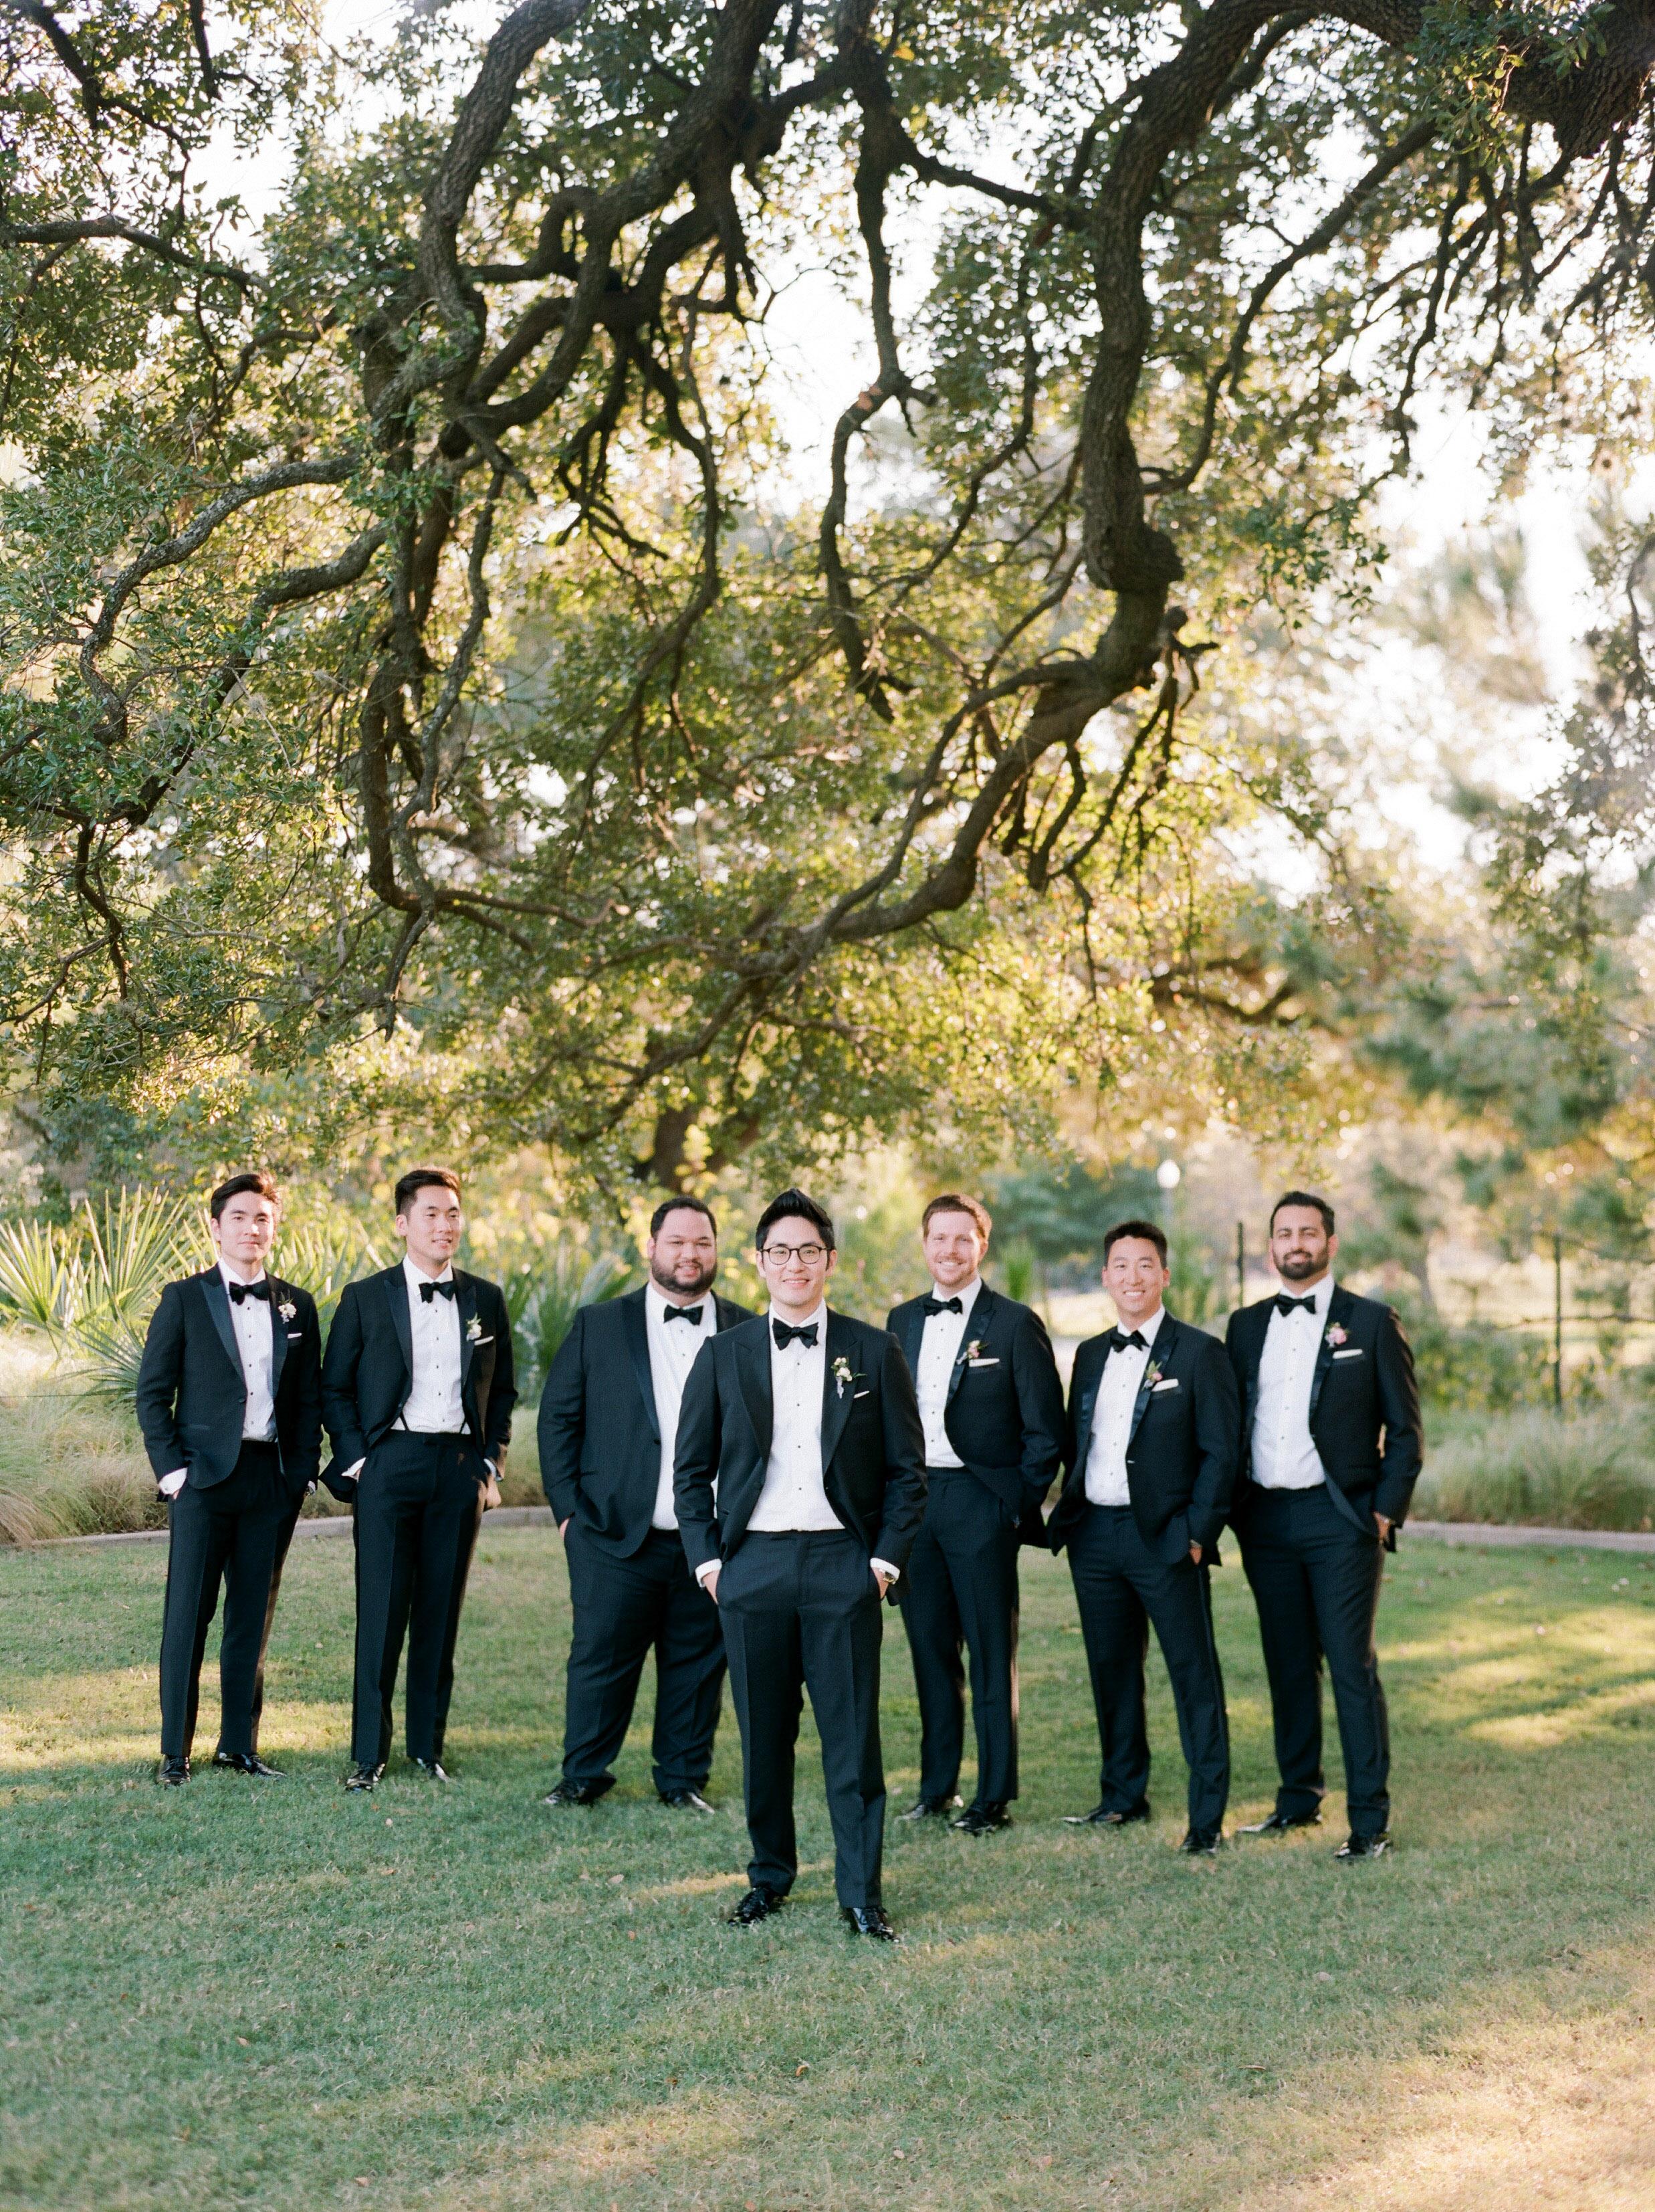 Martha-Stewart-Wedding-Dana-Fernandez-Photography-Josh-Texas-Film-Houston-Wedding-Fine-Art-Photographer-McGovern-Centennial-Gardens-Top-Best-17.jpg